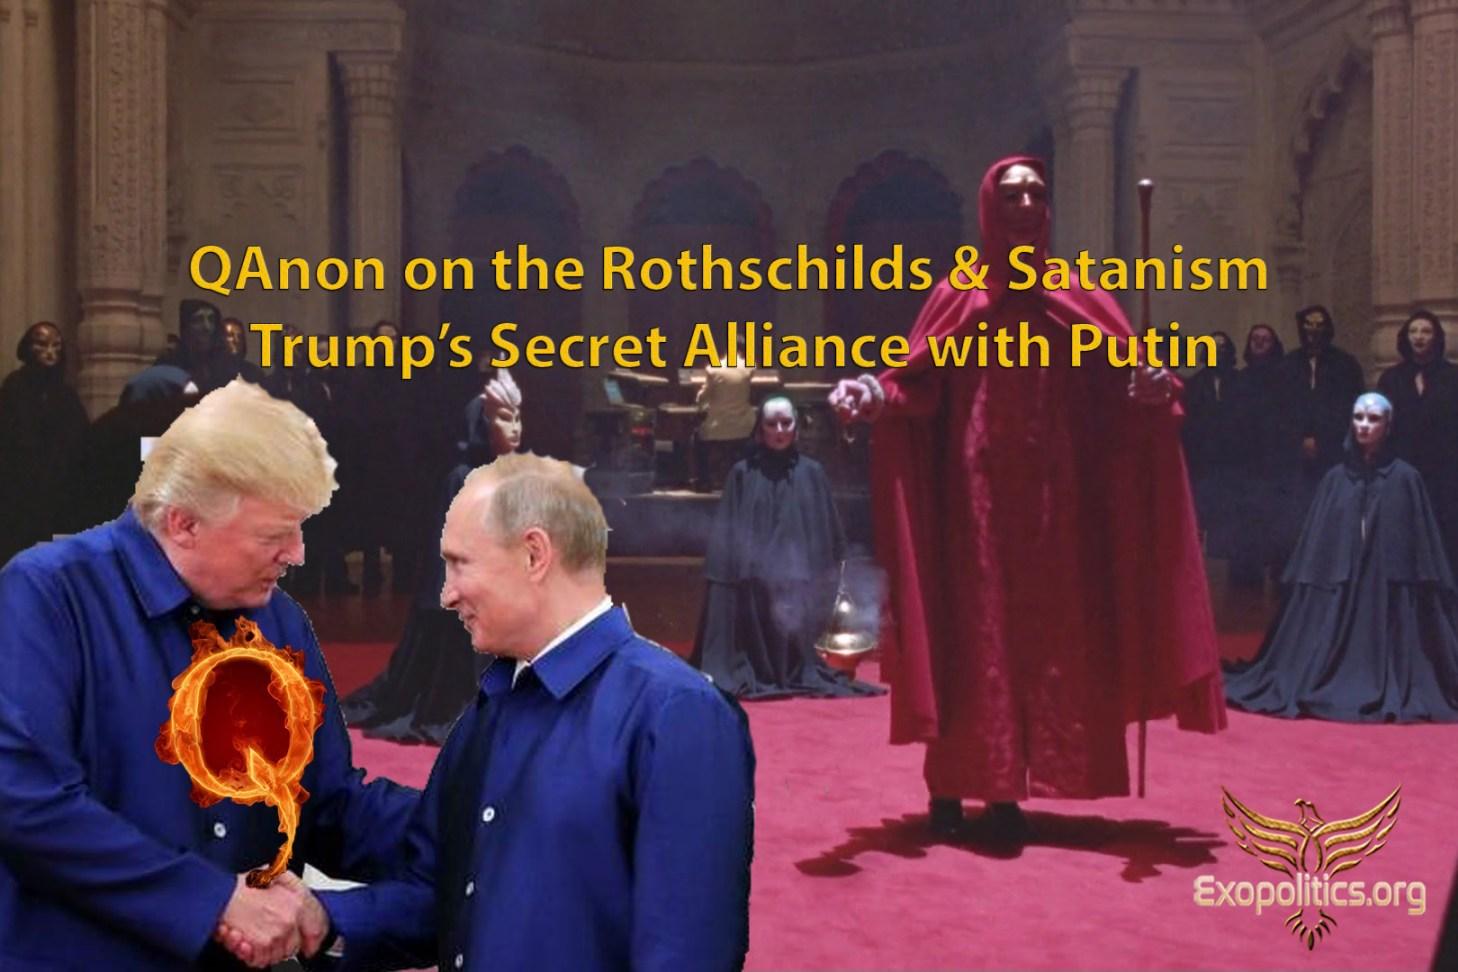 QAnon on the Rothschilds & Satanism – Trump's Secret Alliance with Putin